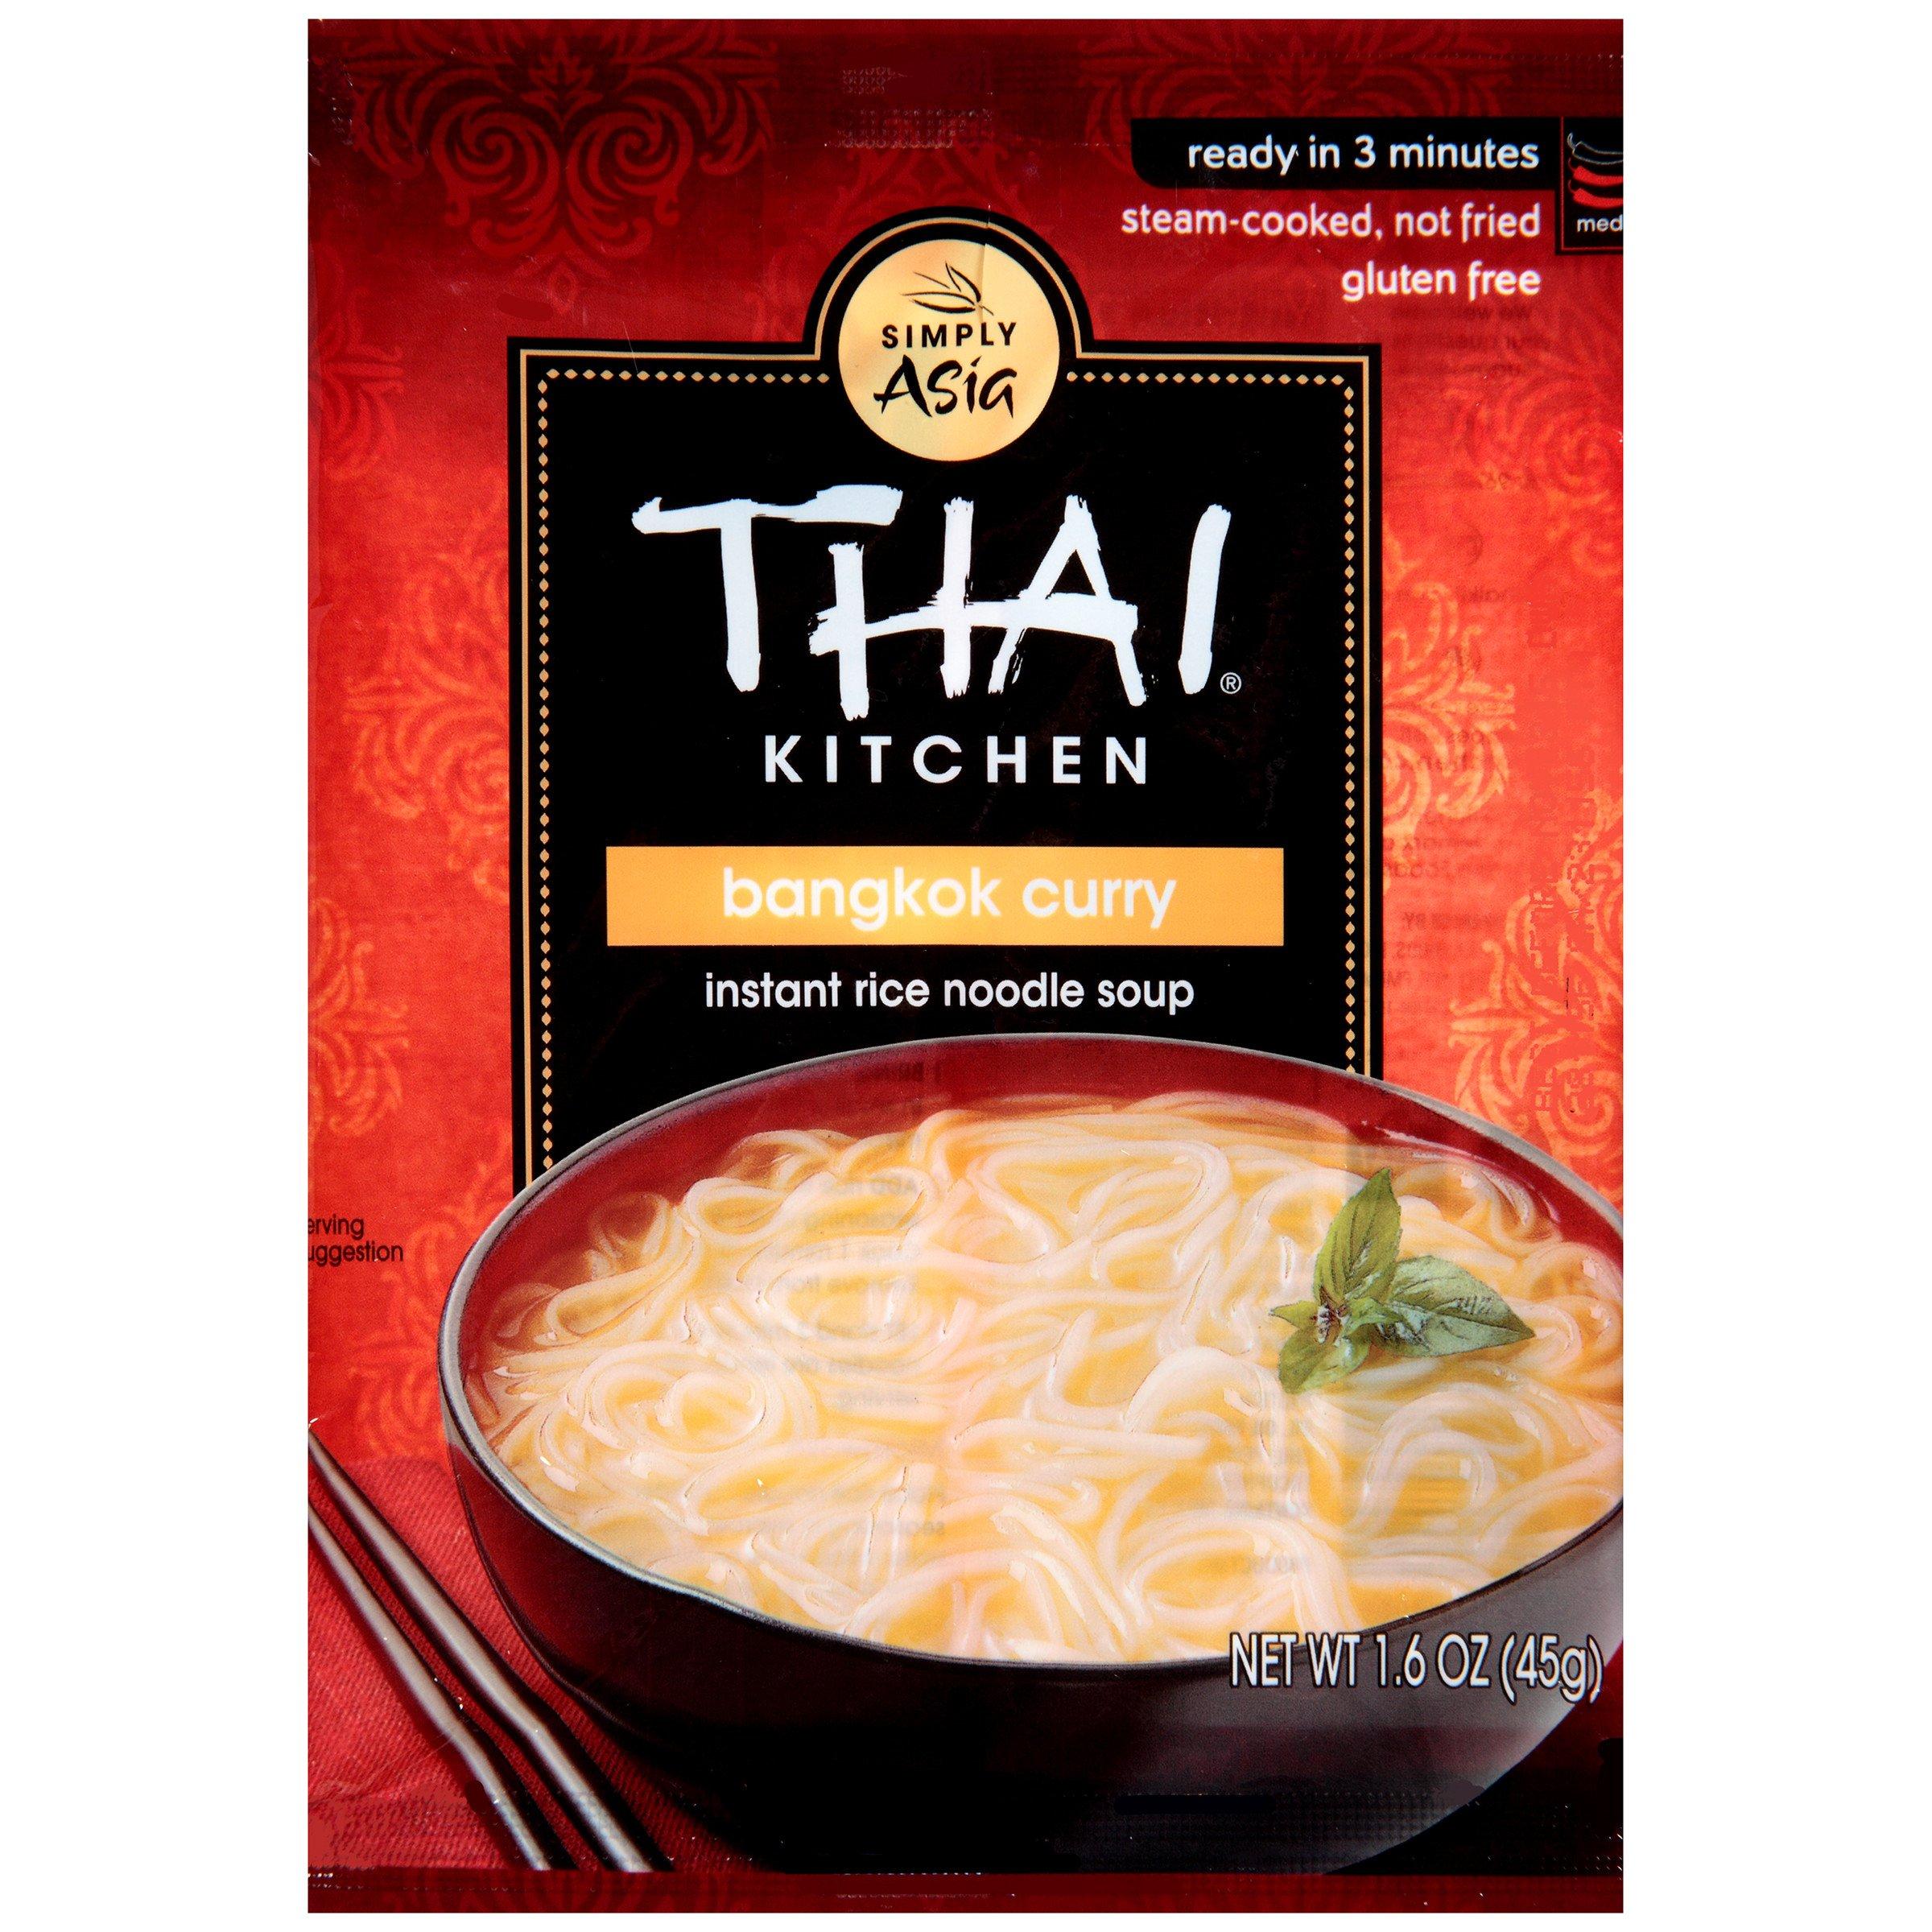 Thai Kitchen Instant Rice Noodle Soup Gluten Free